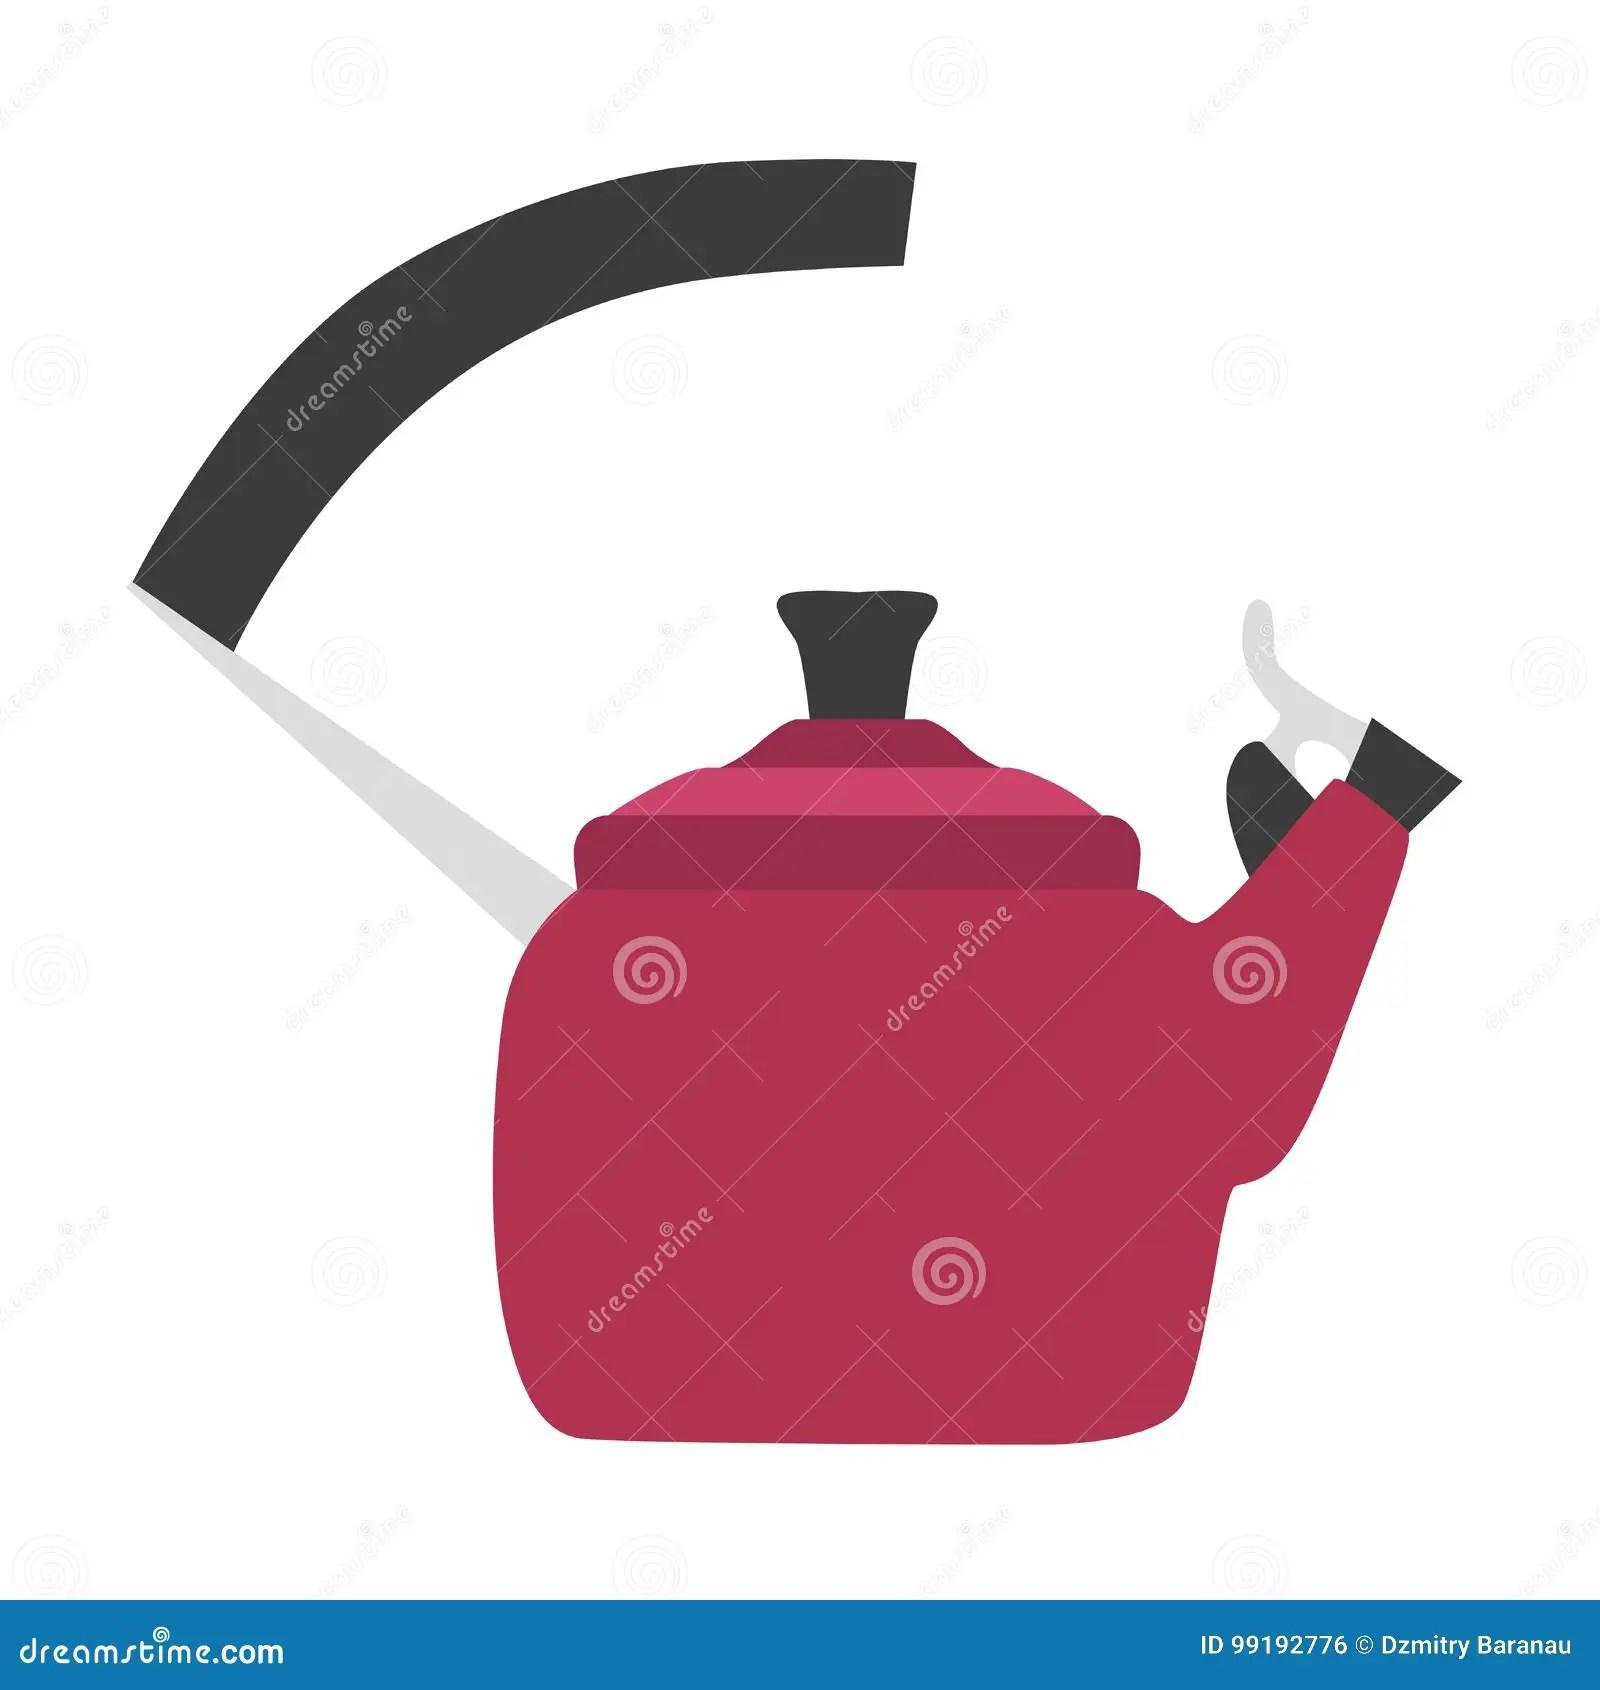 kitchen aid electric kettle etched glass cabinet doors 平水壶例证传染媒介茶设计上面火炉蒸汽厨房器具热的茶壶向量例证 插画 平水壶例证传染媒介茶设计上面火炉蒸汽厨房器具热的茶壶